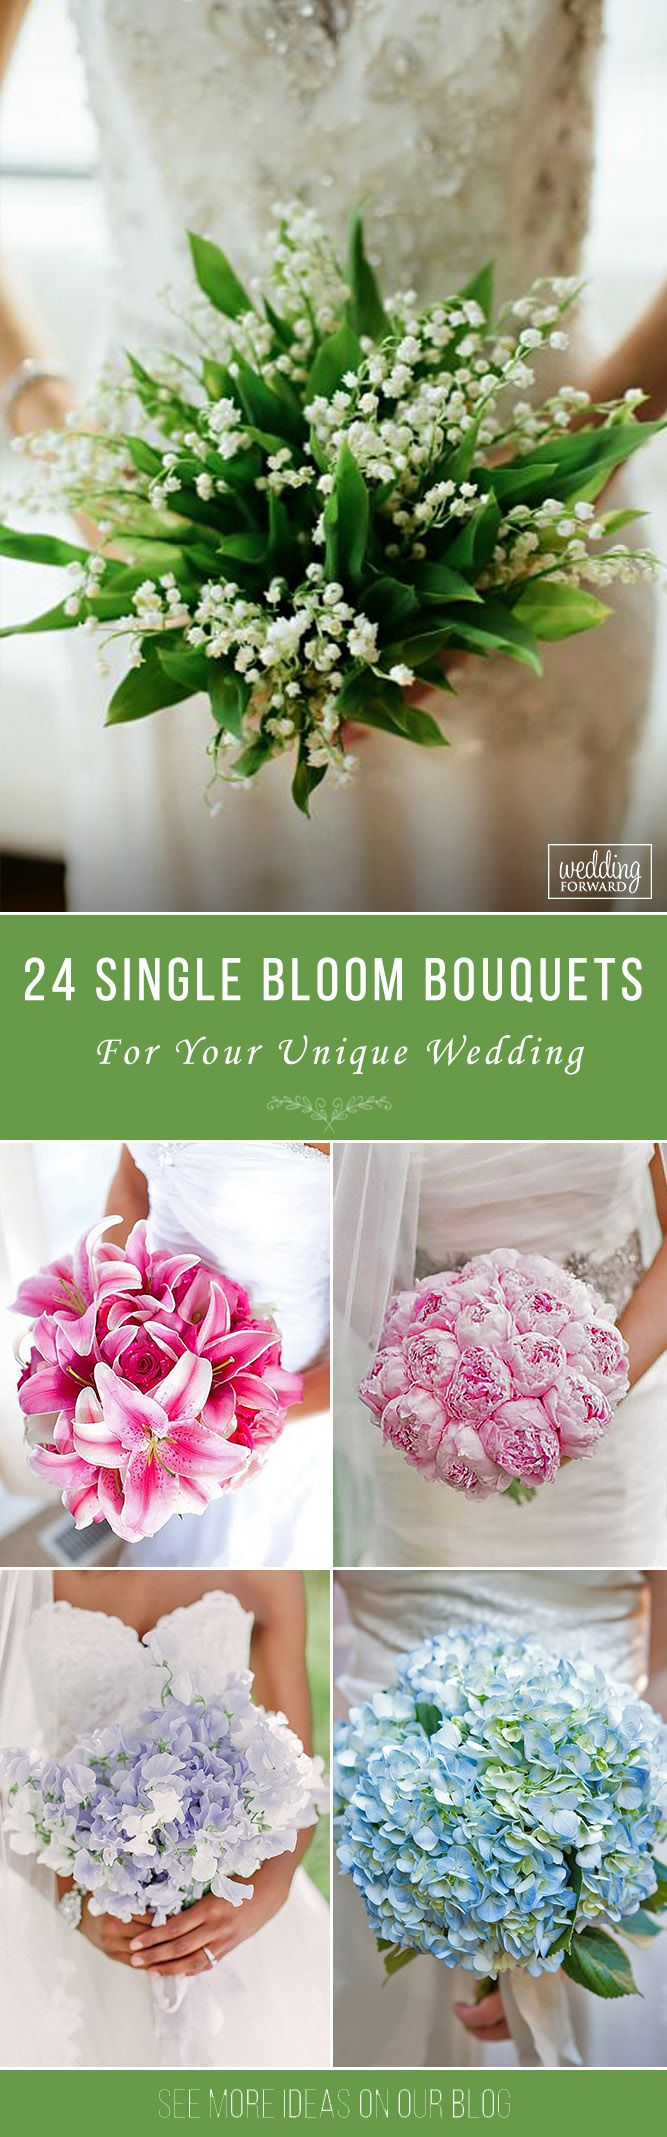 27 Stylish Single Bloom Wedding Bouquets   Wedding, Wedding and ...